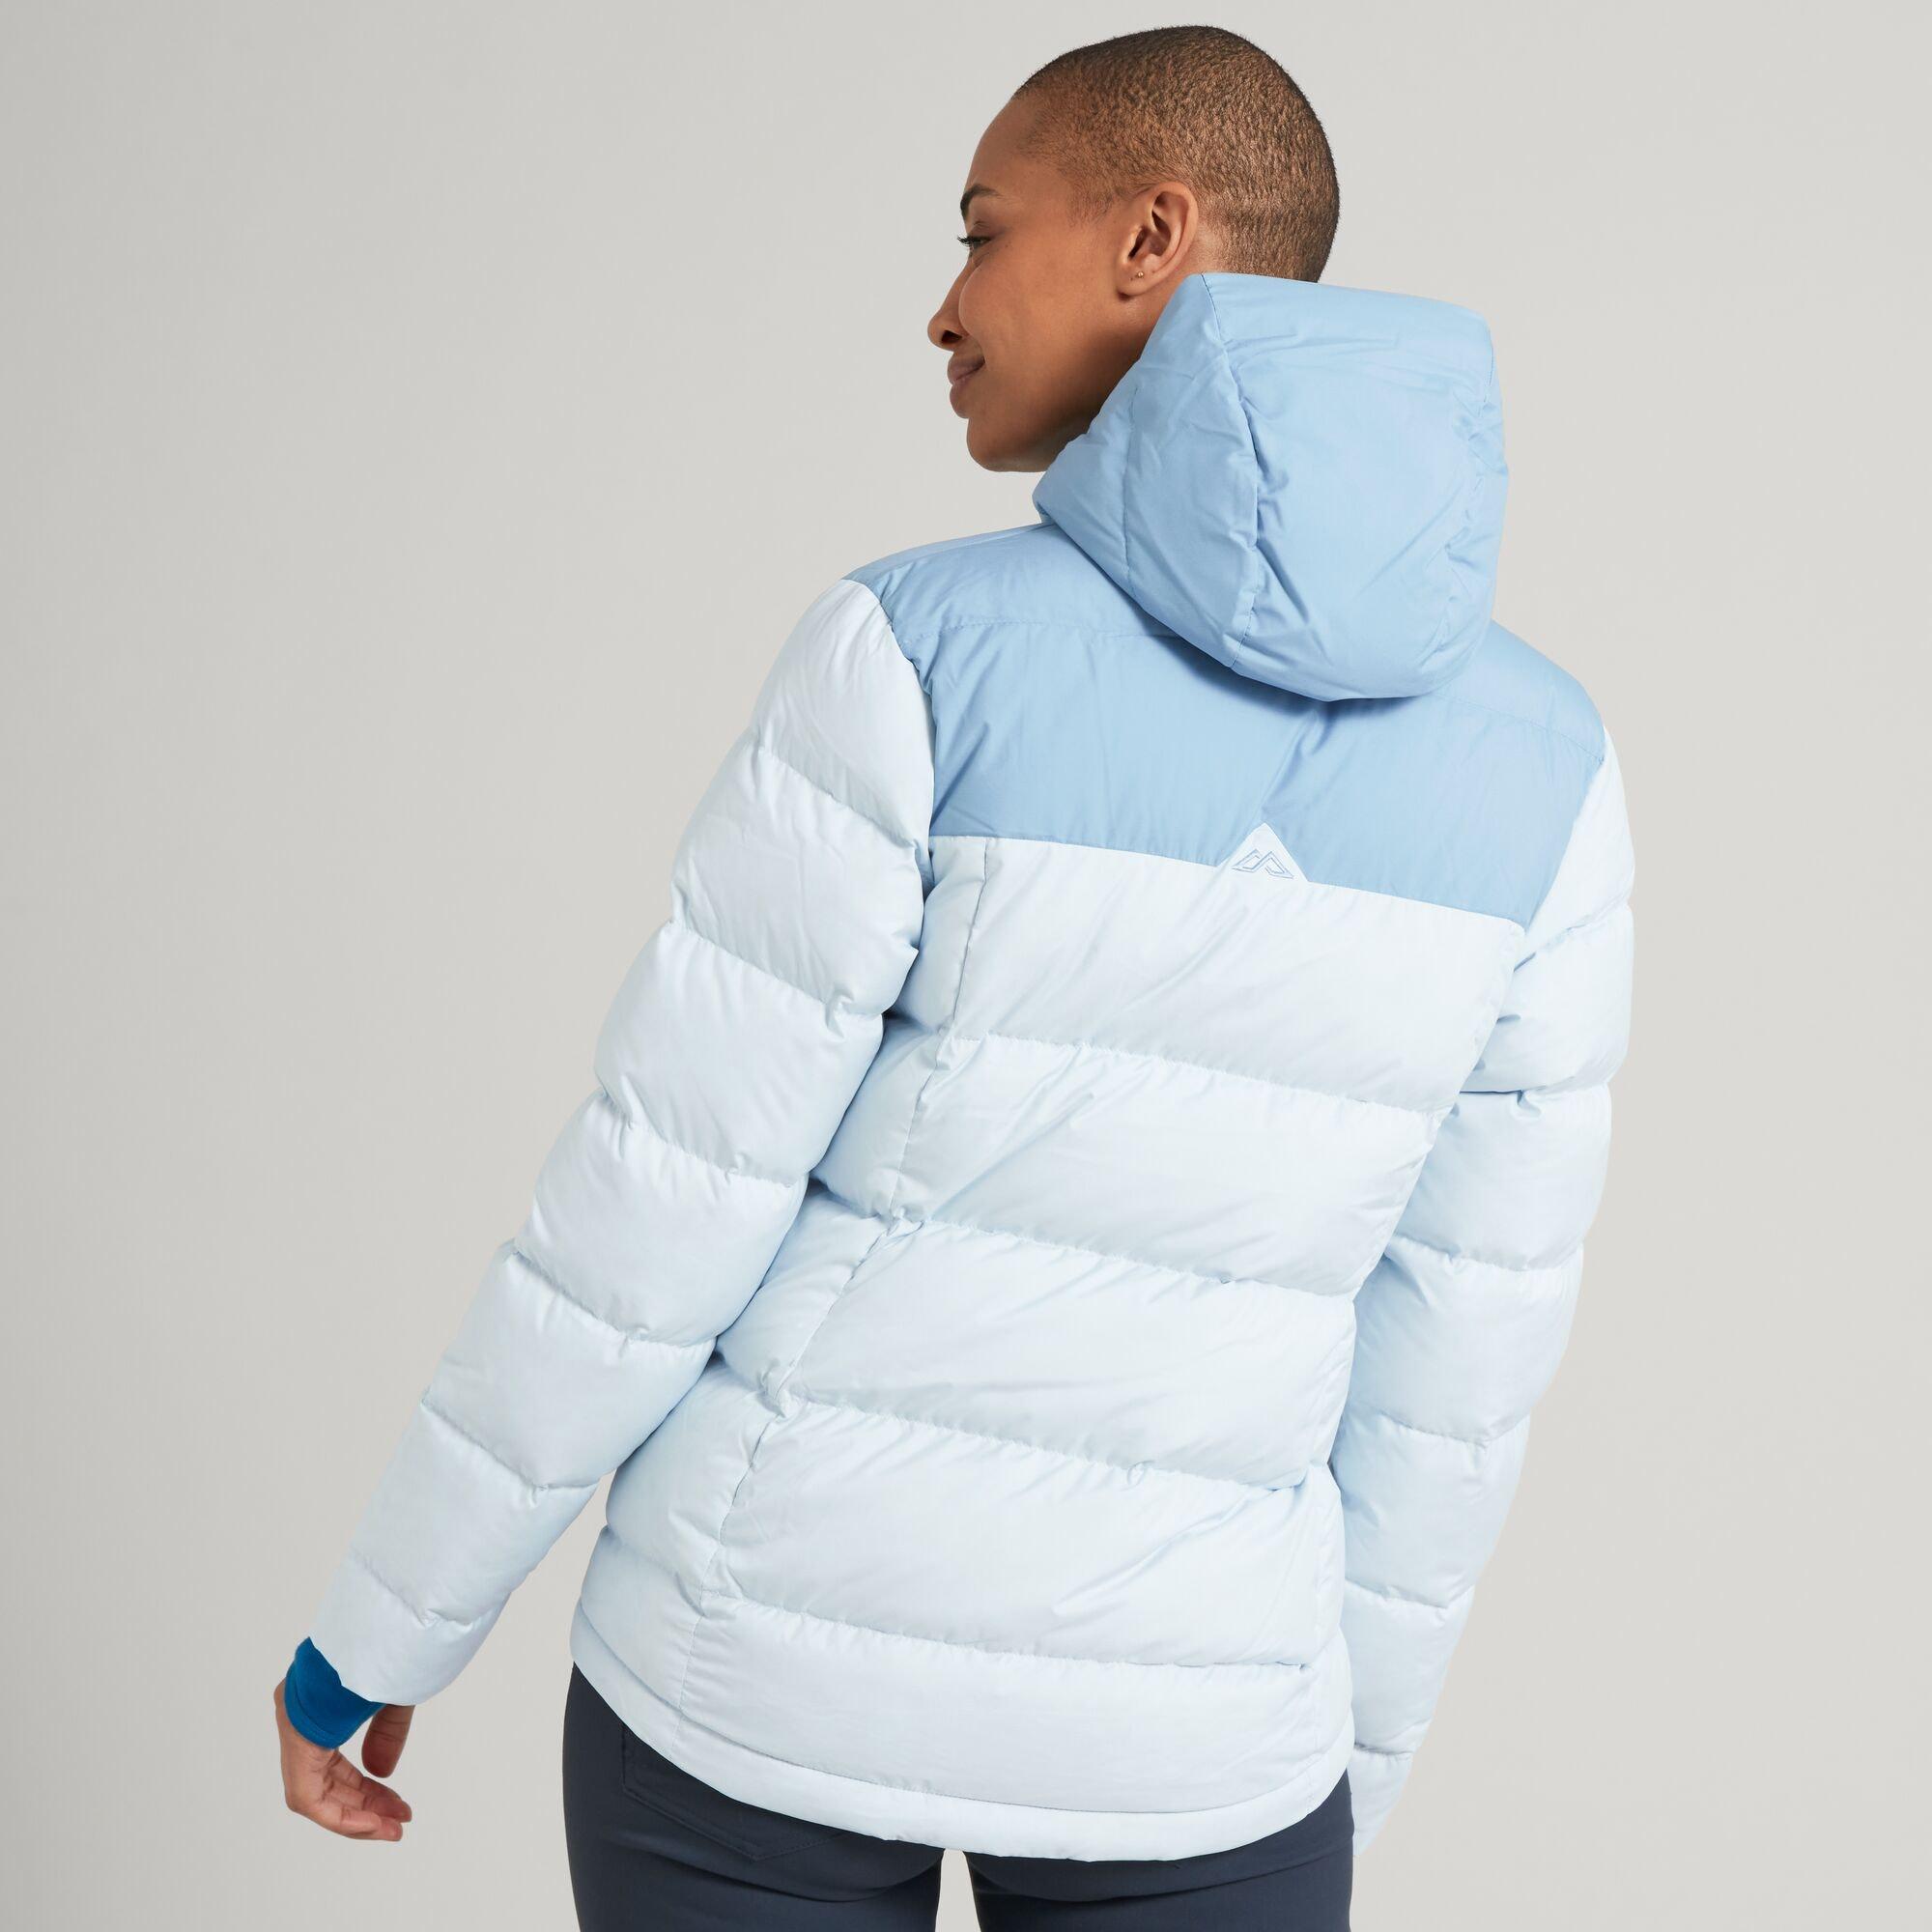 thumbnail 20 - NEW Kathmandu Epiq Womens Hooded Down Puffer 600 Fill Warm Outdoor Winter Jacket